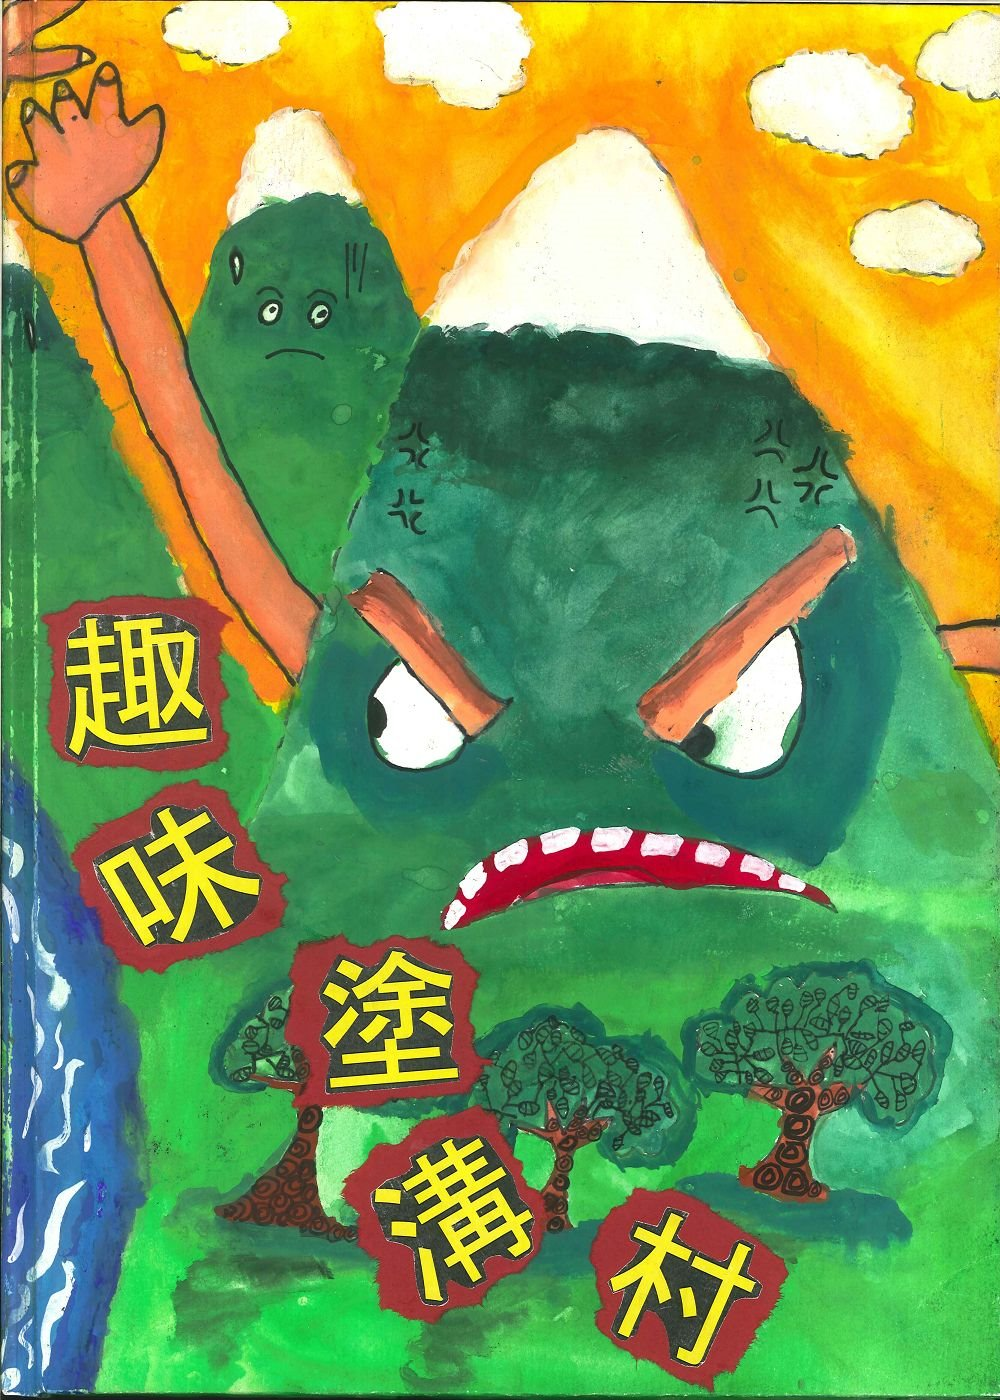 http://www.dlps.cyc.edu.tw/uploads/tadgallery/2017_02_19/601_pb4-1.jpg 趣味塗溝村